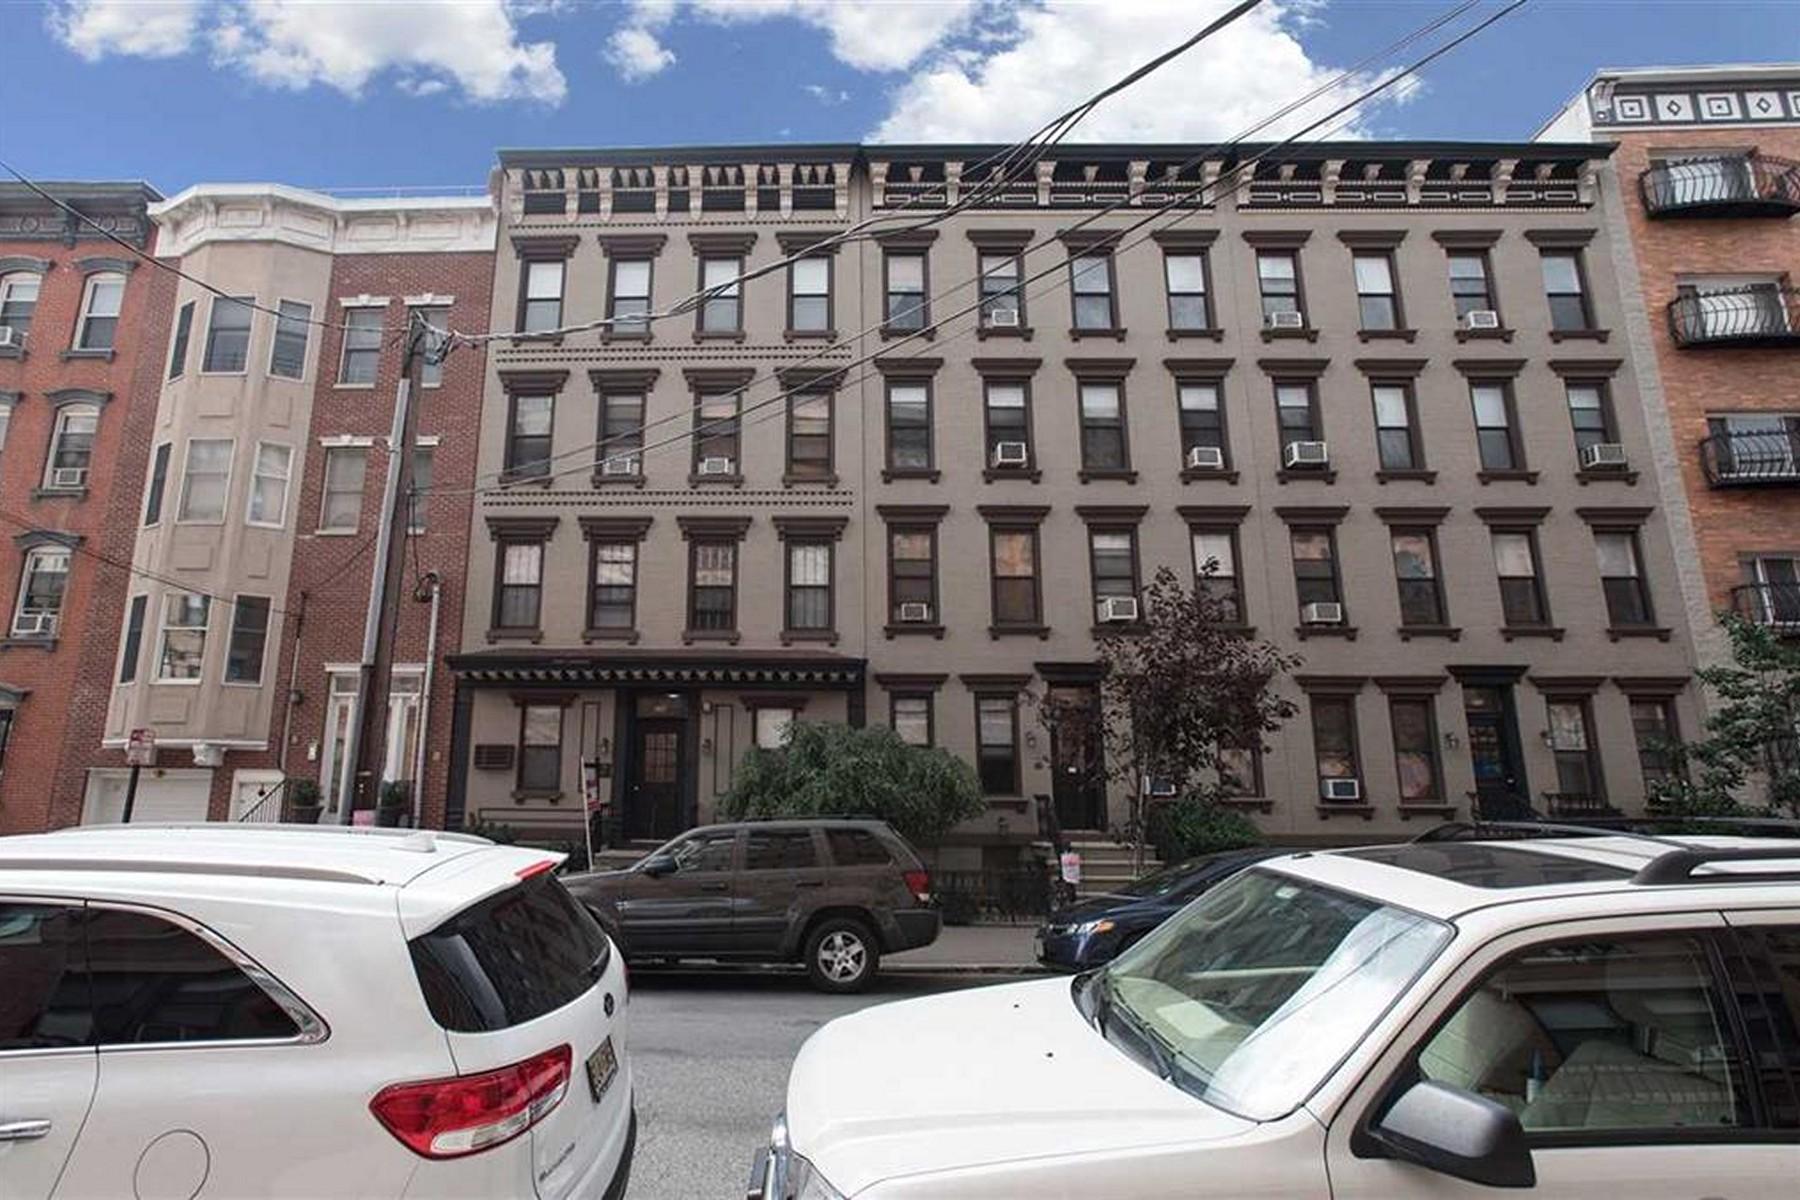 Condominiums для того Продажа на Super Clean Sunny One bed/one bath on tree lined Willow Avenue. 208 Willow Ave #305, Hoboken, Нью-Джерси 07030 Соединенные Штаты